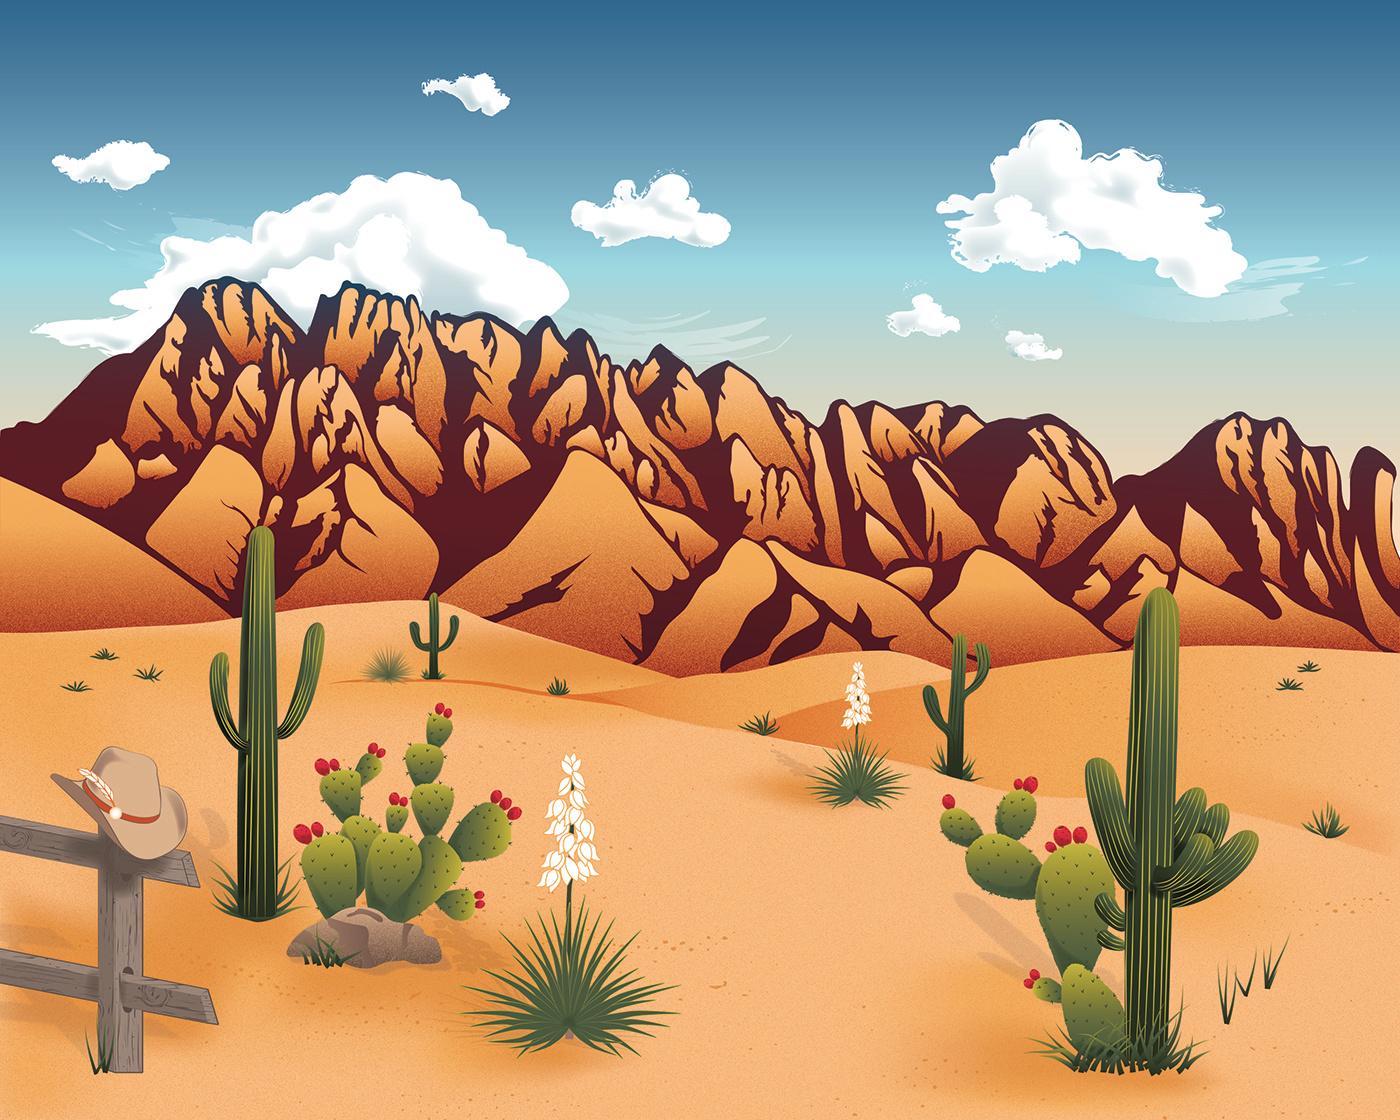 Organ Mountains / Las Cruces